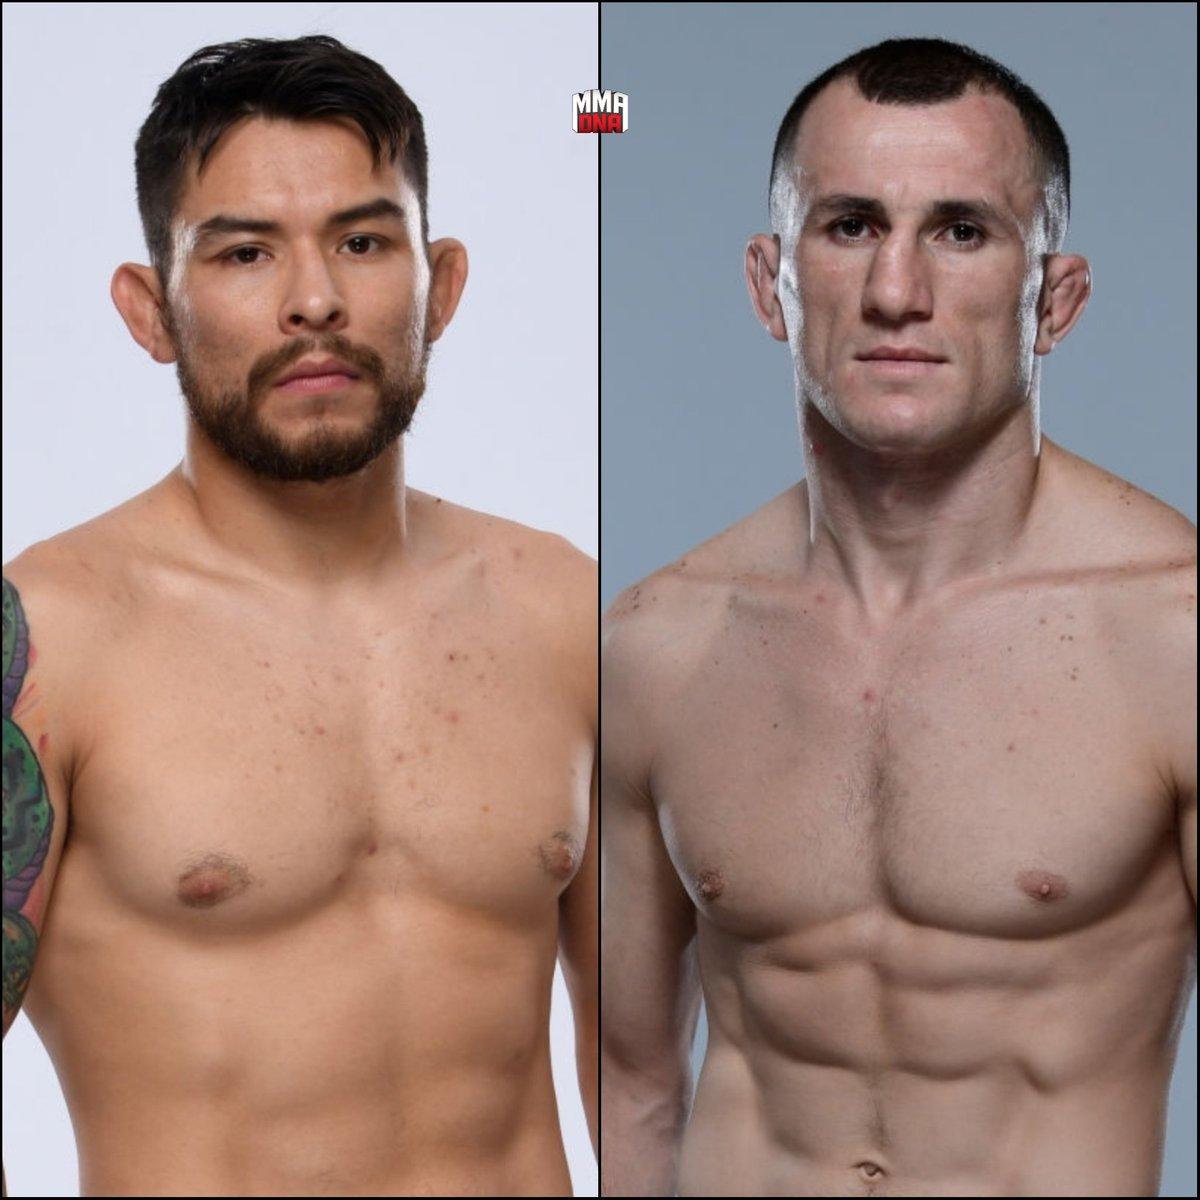 Ray Borg will fight Merab Dvalishvili at UFC event on June 13th in Las Vegas. (per @Farah_Hannoun & @mma_kings) #UFC #MMA #UFCESPN #WHATAFIGHT https://t.co/G94za7msiT